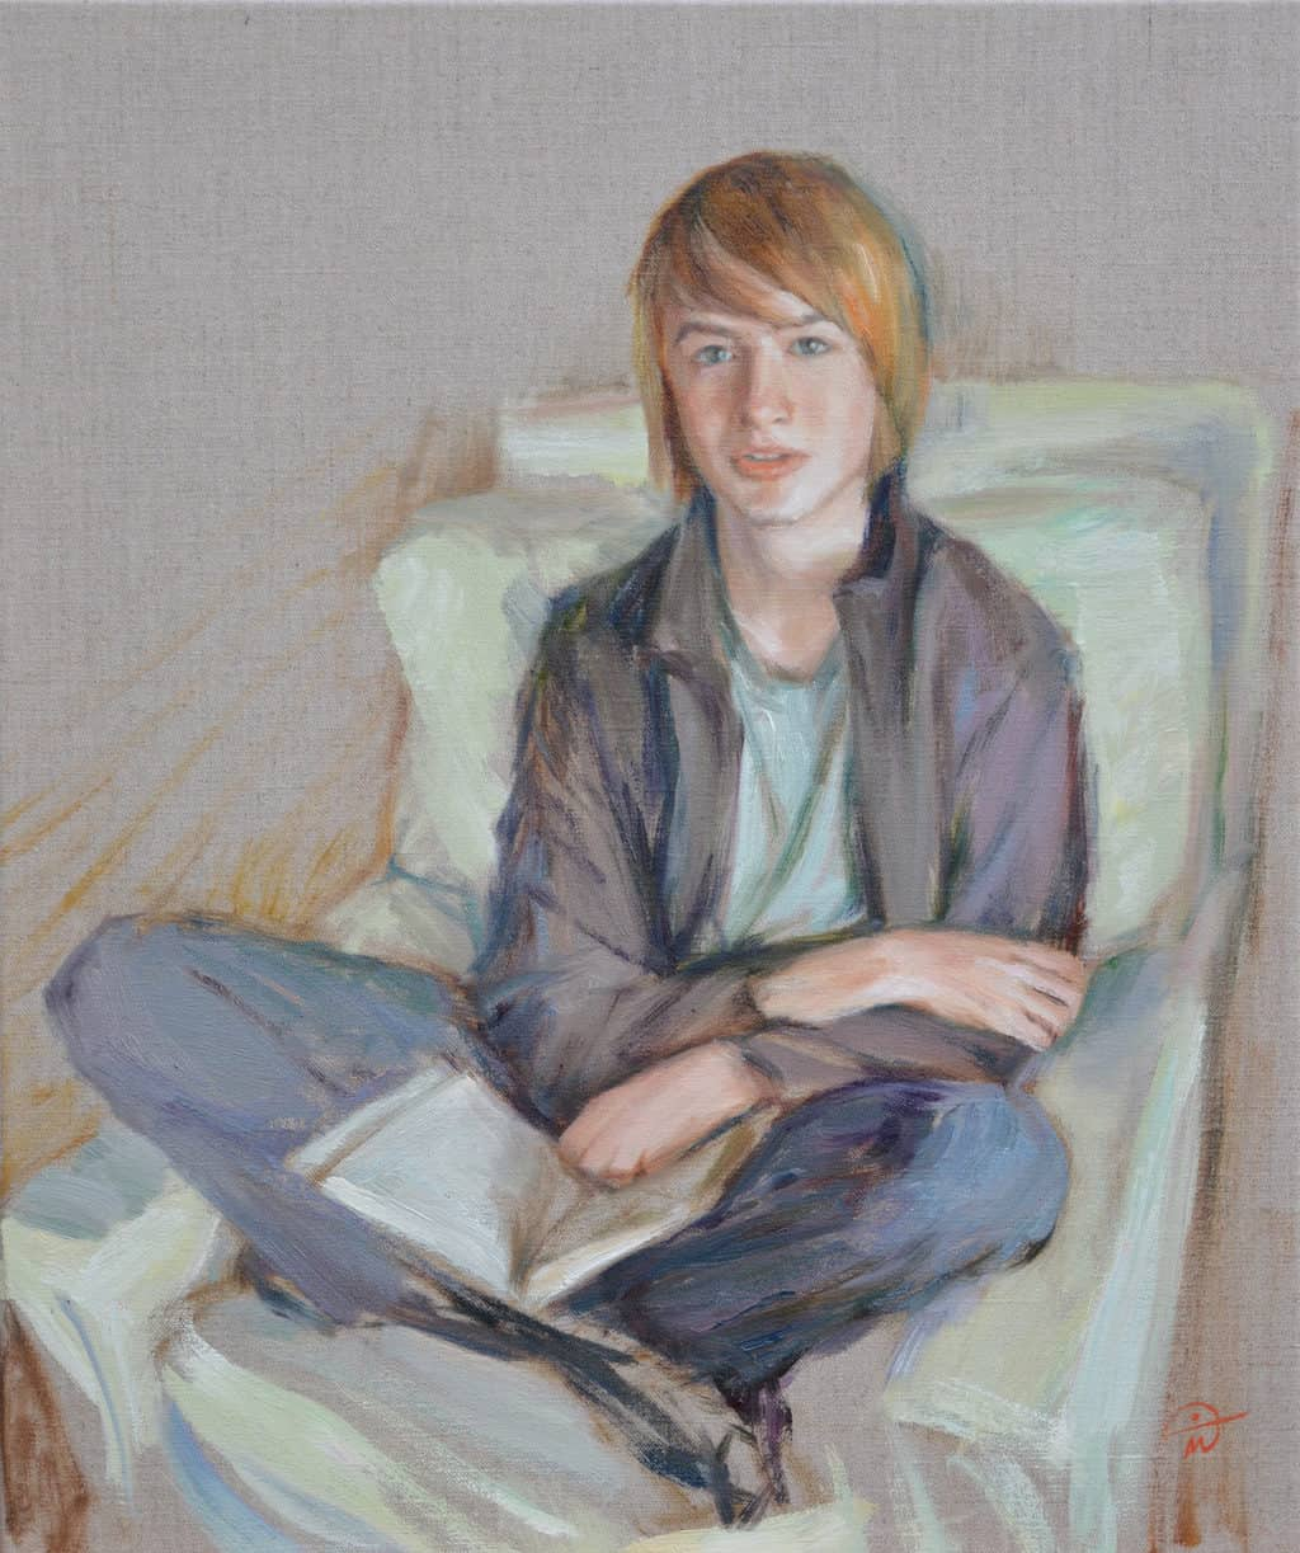 Portrait of Alfie. Oil on canvas. Portrait commission by artist Marina Kim